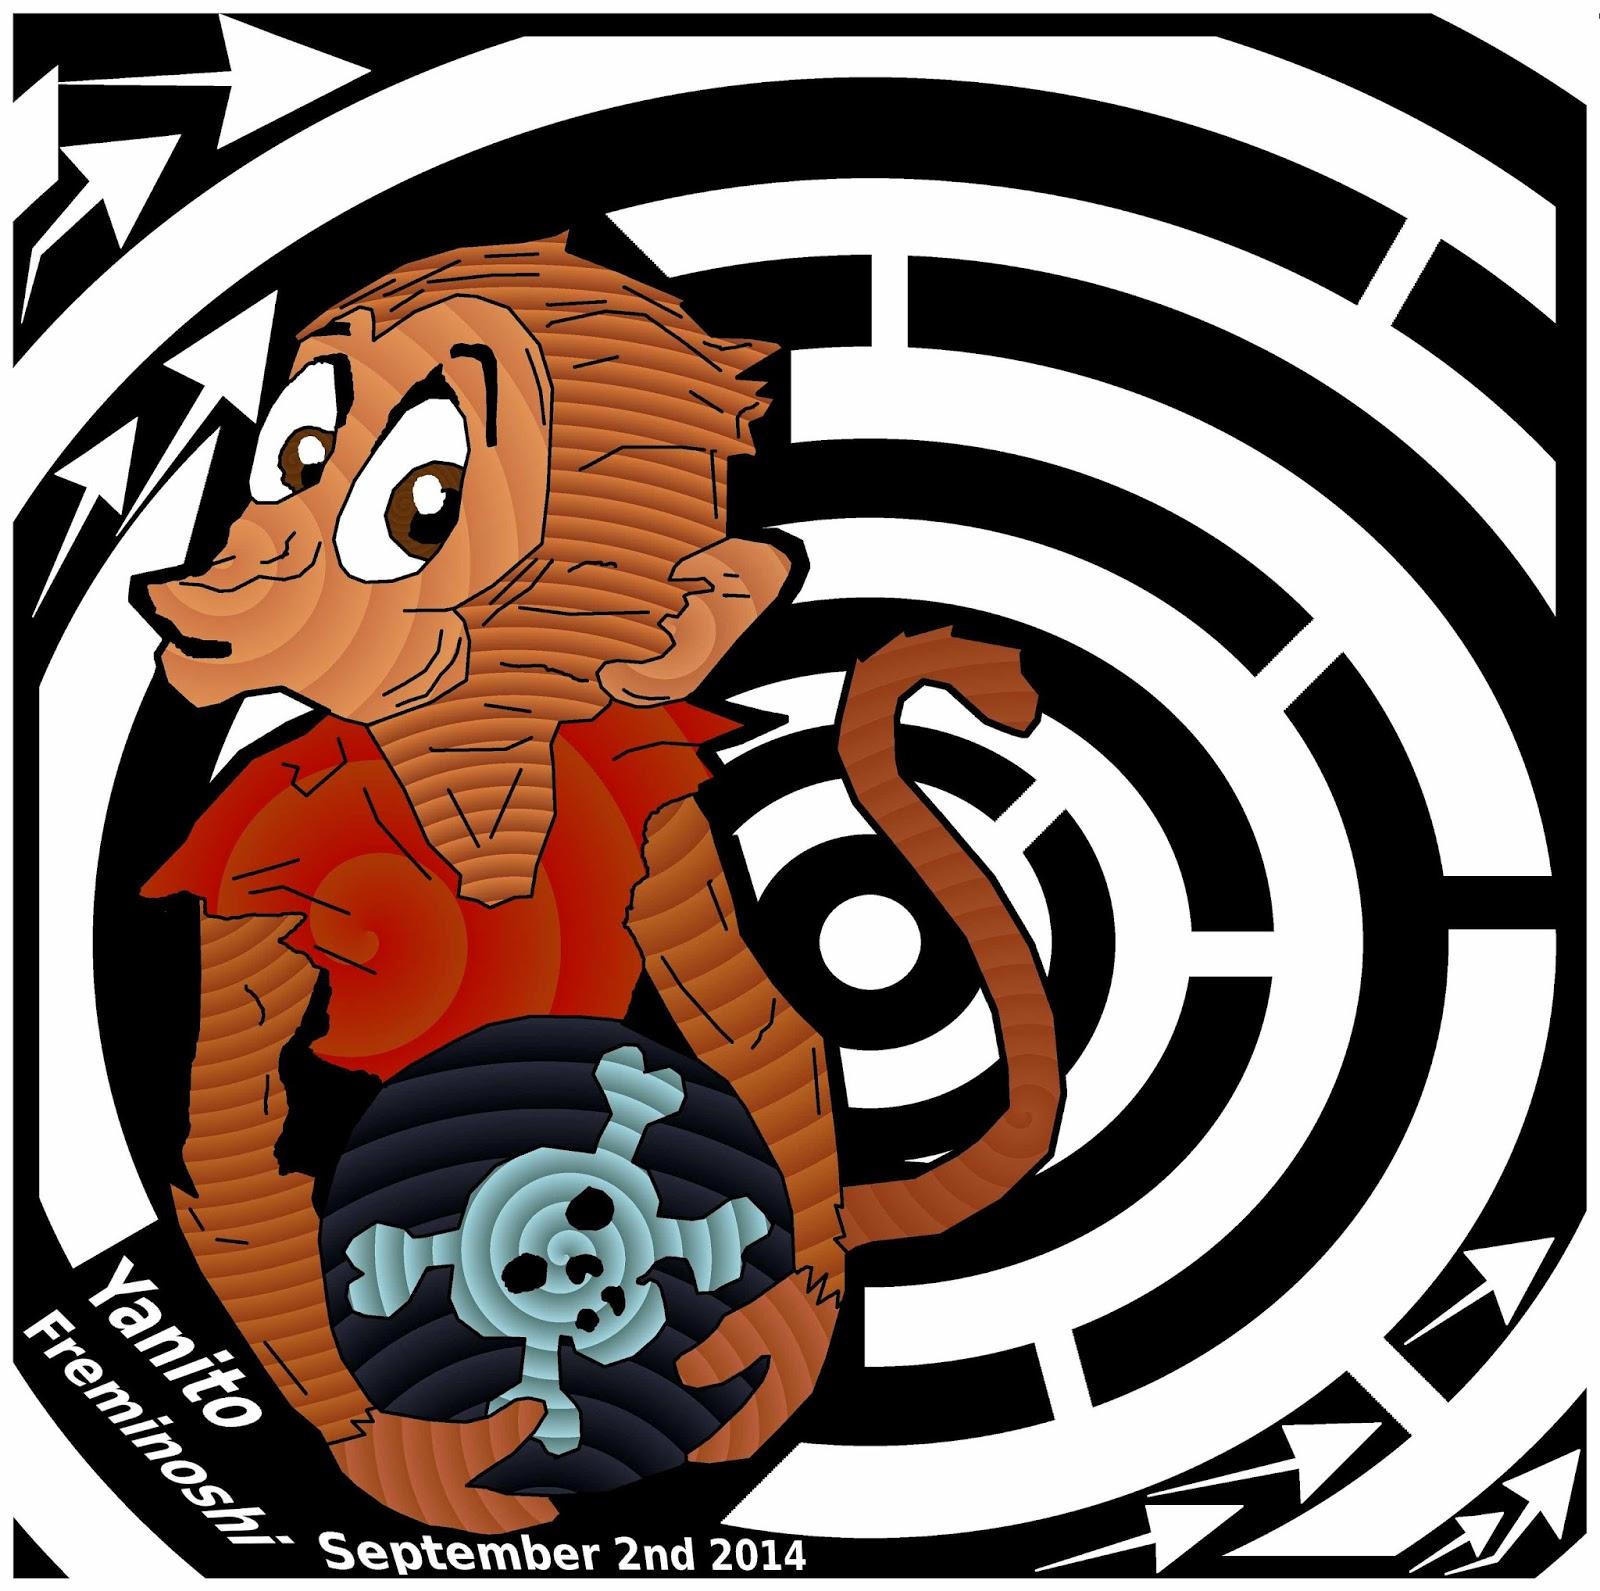 maze of monkey holding cannon ball